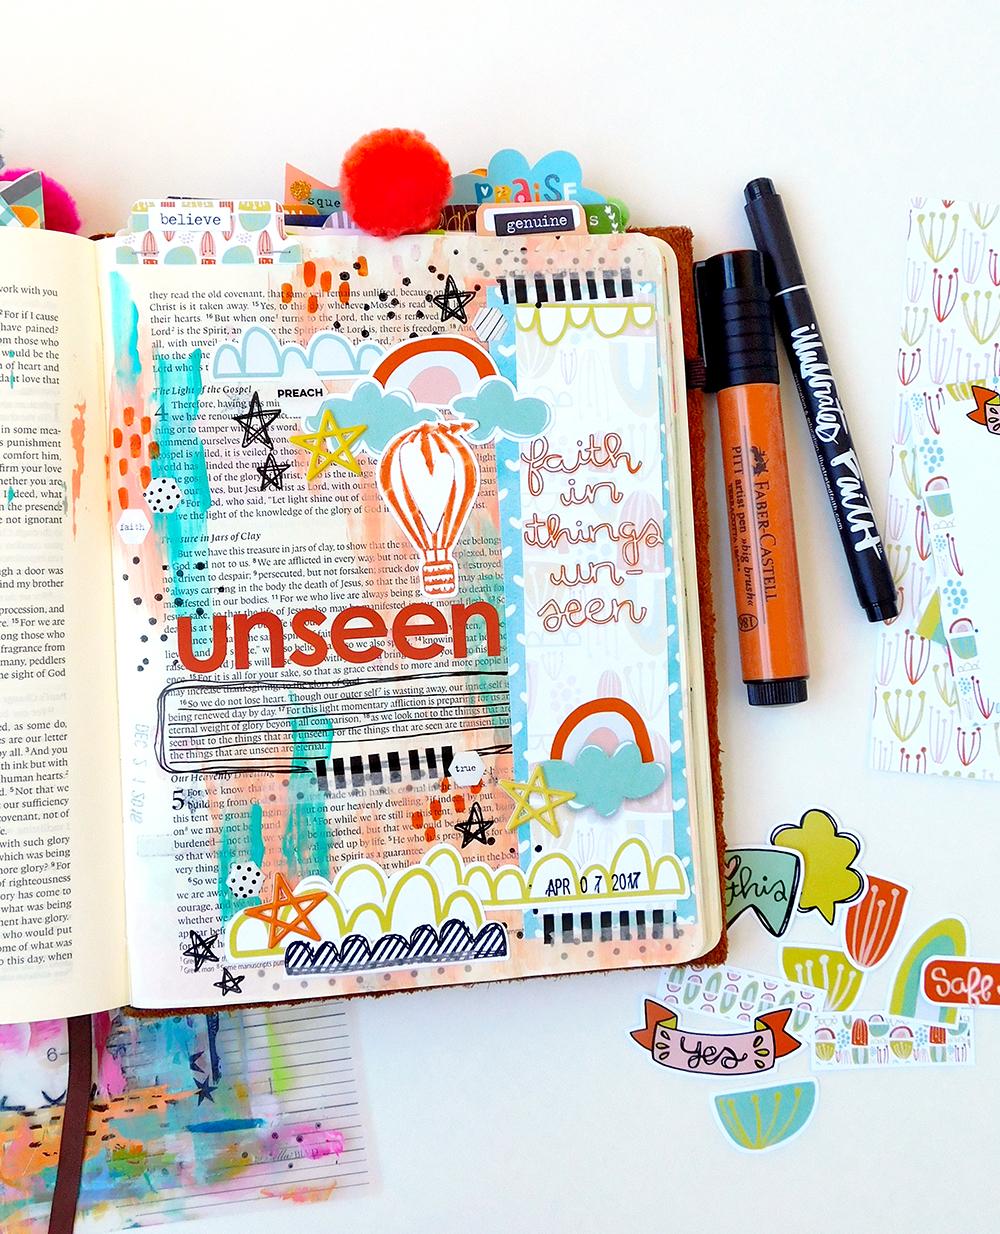 hybrid digital mixed media art journaling bible entry by Elaine Davis | Believe in Things Unseen